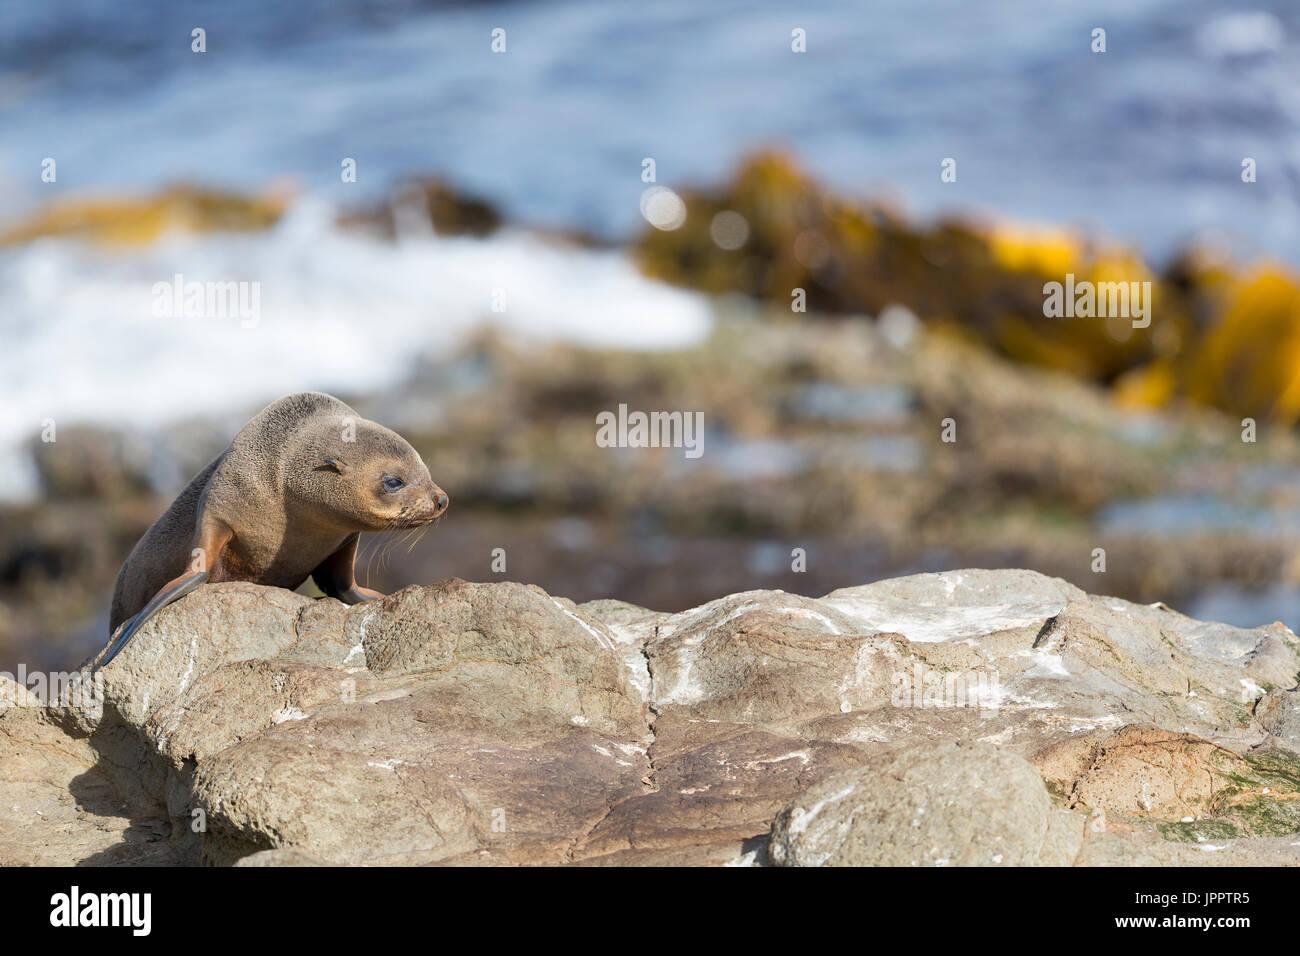 New Zealand Fur Seals or Kekeno at New Zealand Asia Pacific - Stock Image